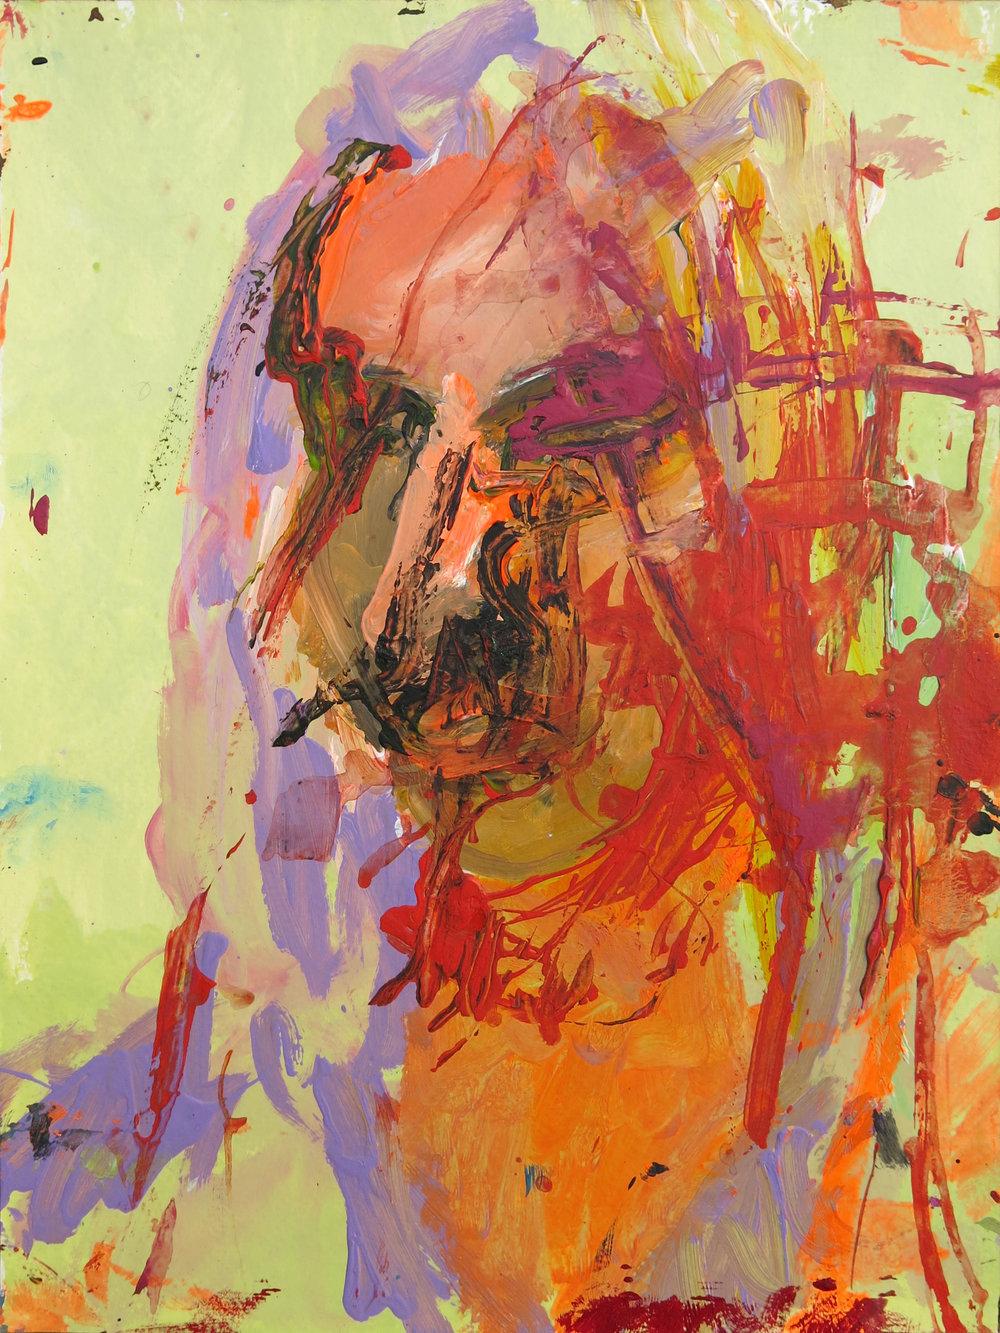 Barbra Streisand Portrait #14